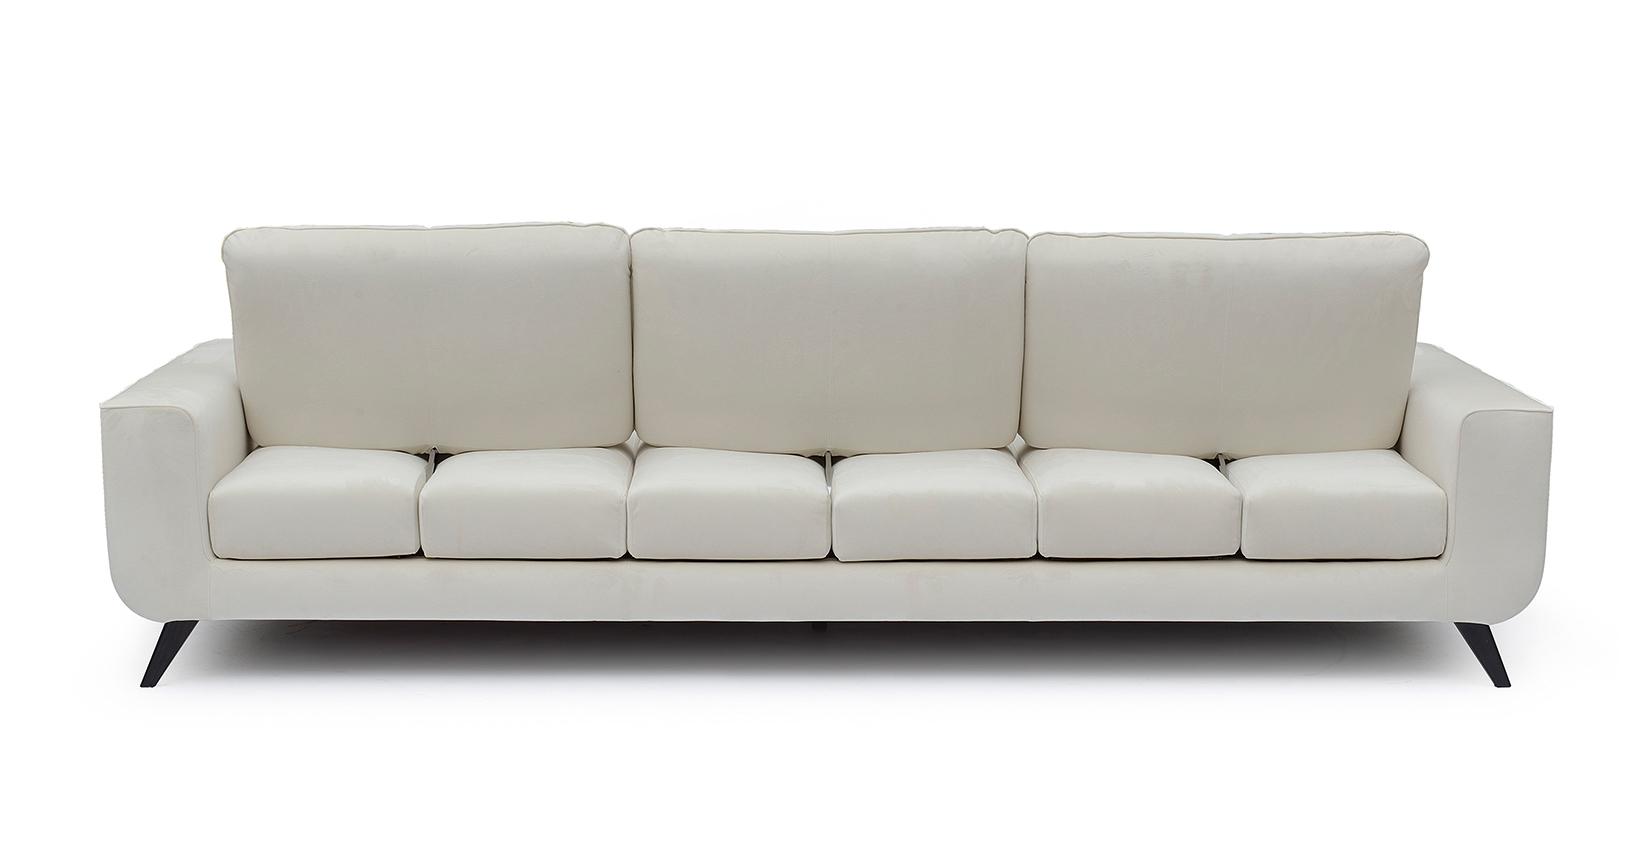 isabella-4-sedute-posteriore-tessuto-bianco